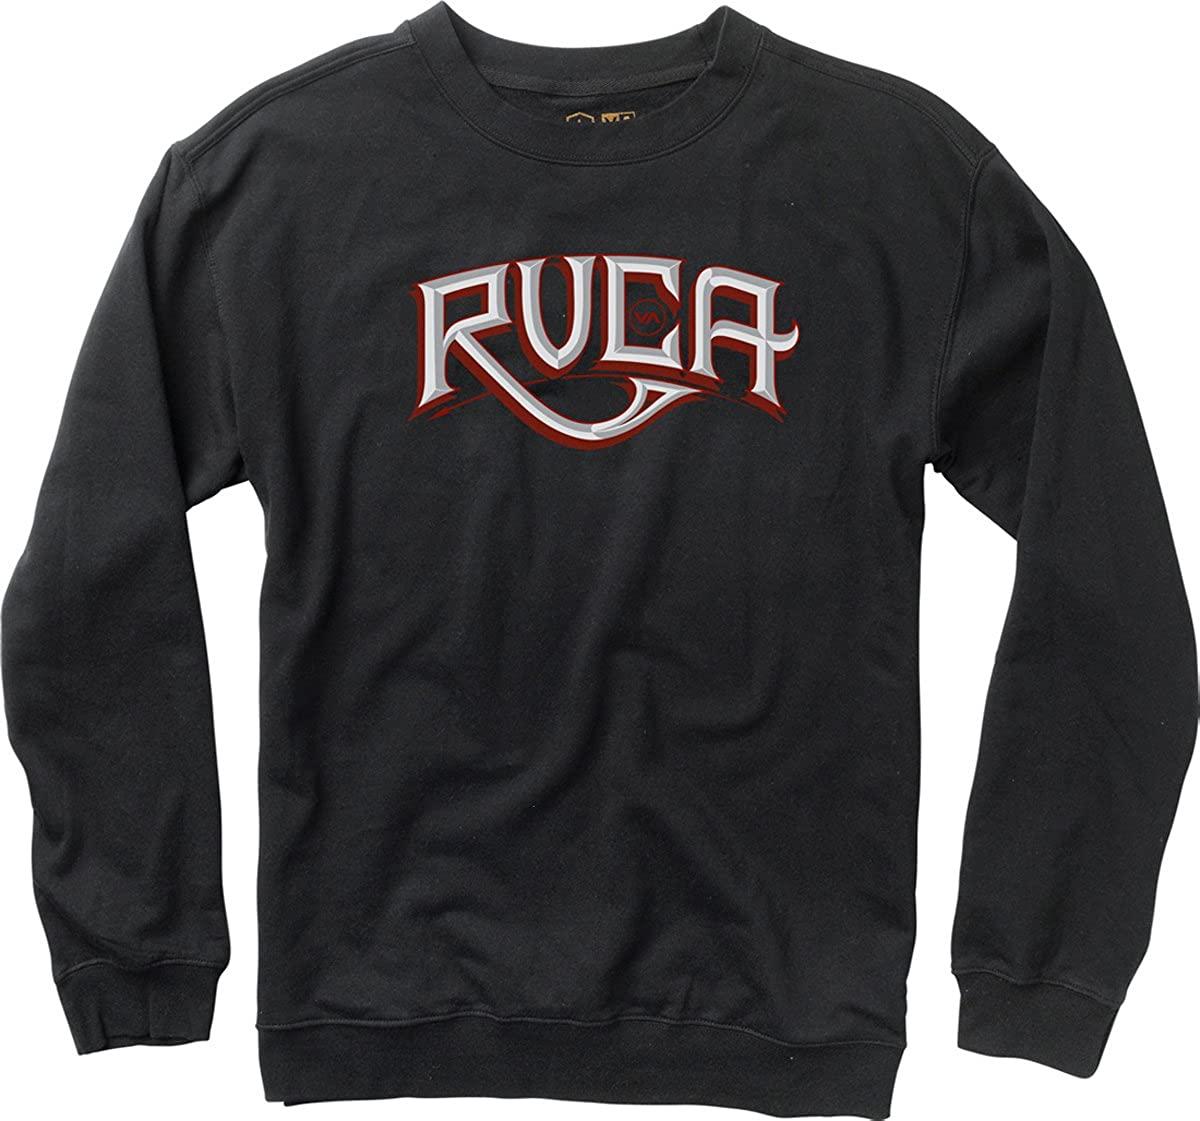 RVCA Carve Black Red Gray White Screenprint Pullover Crewneck Men's Sweatshirt